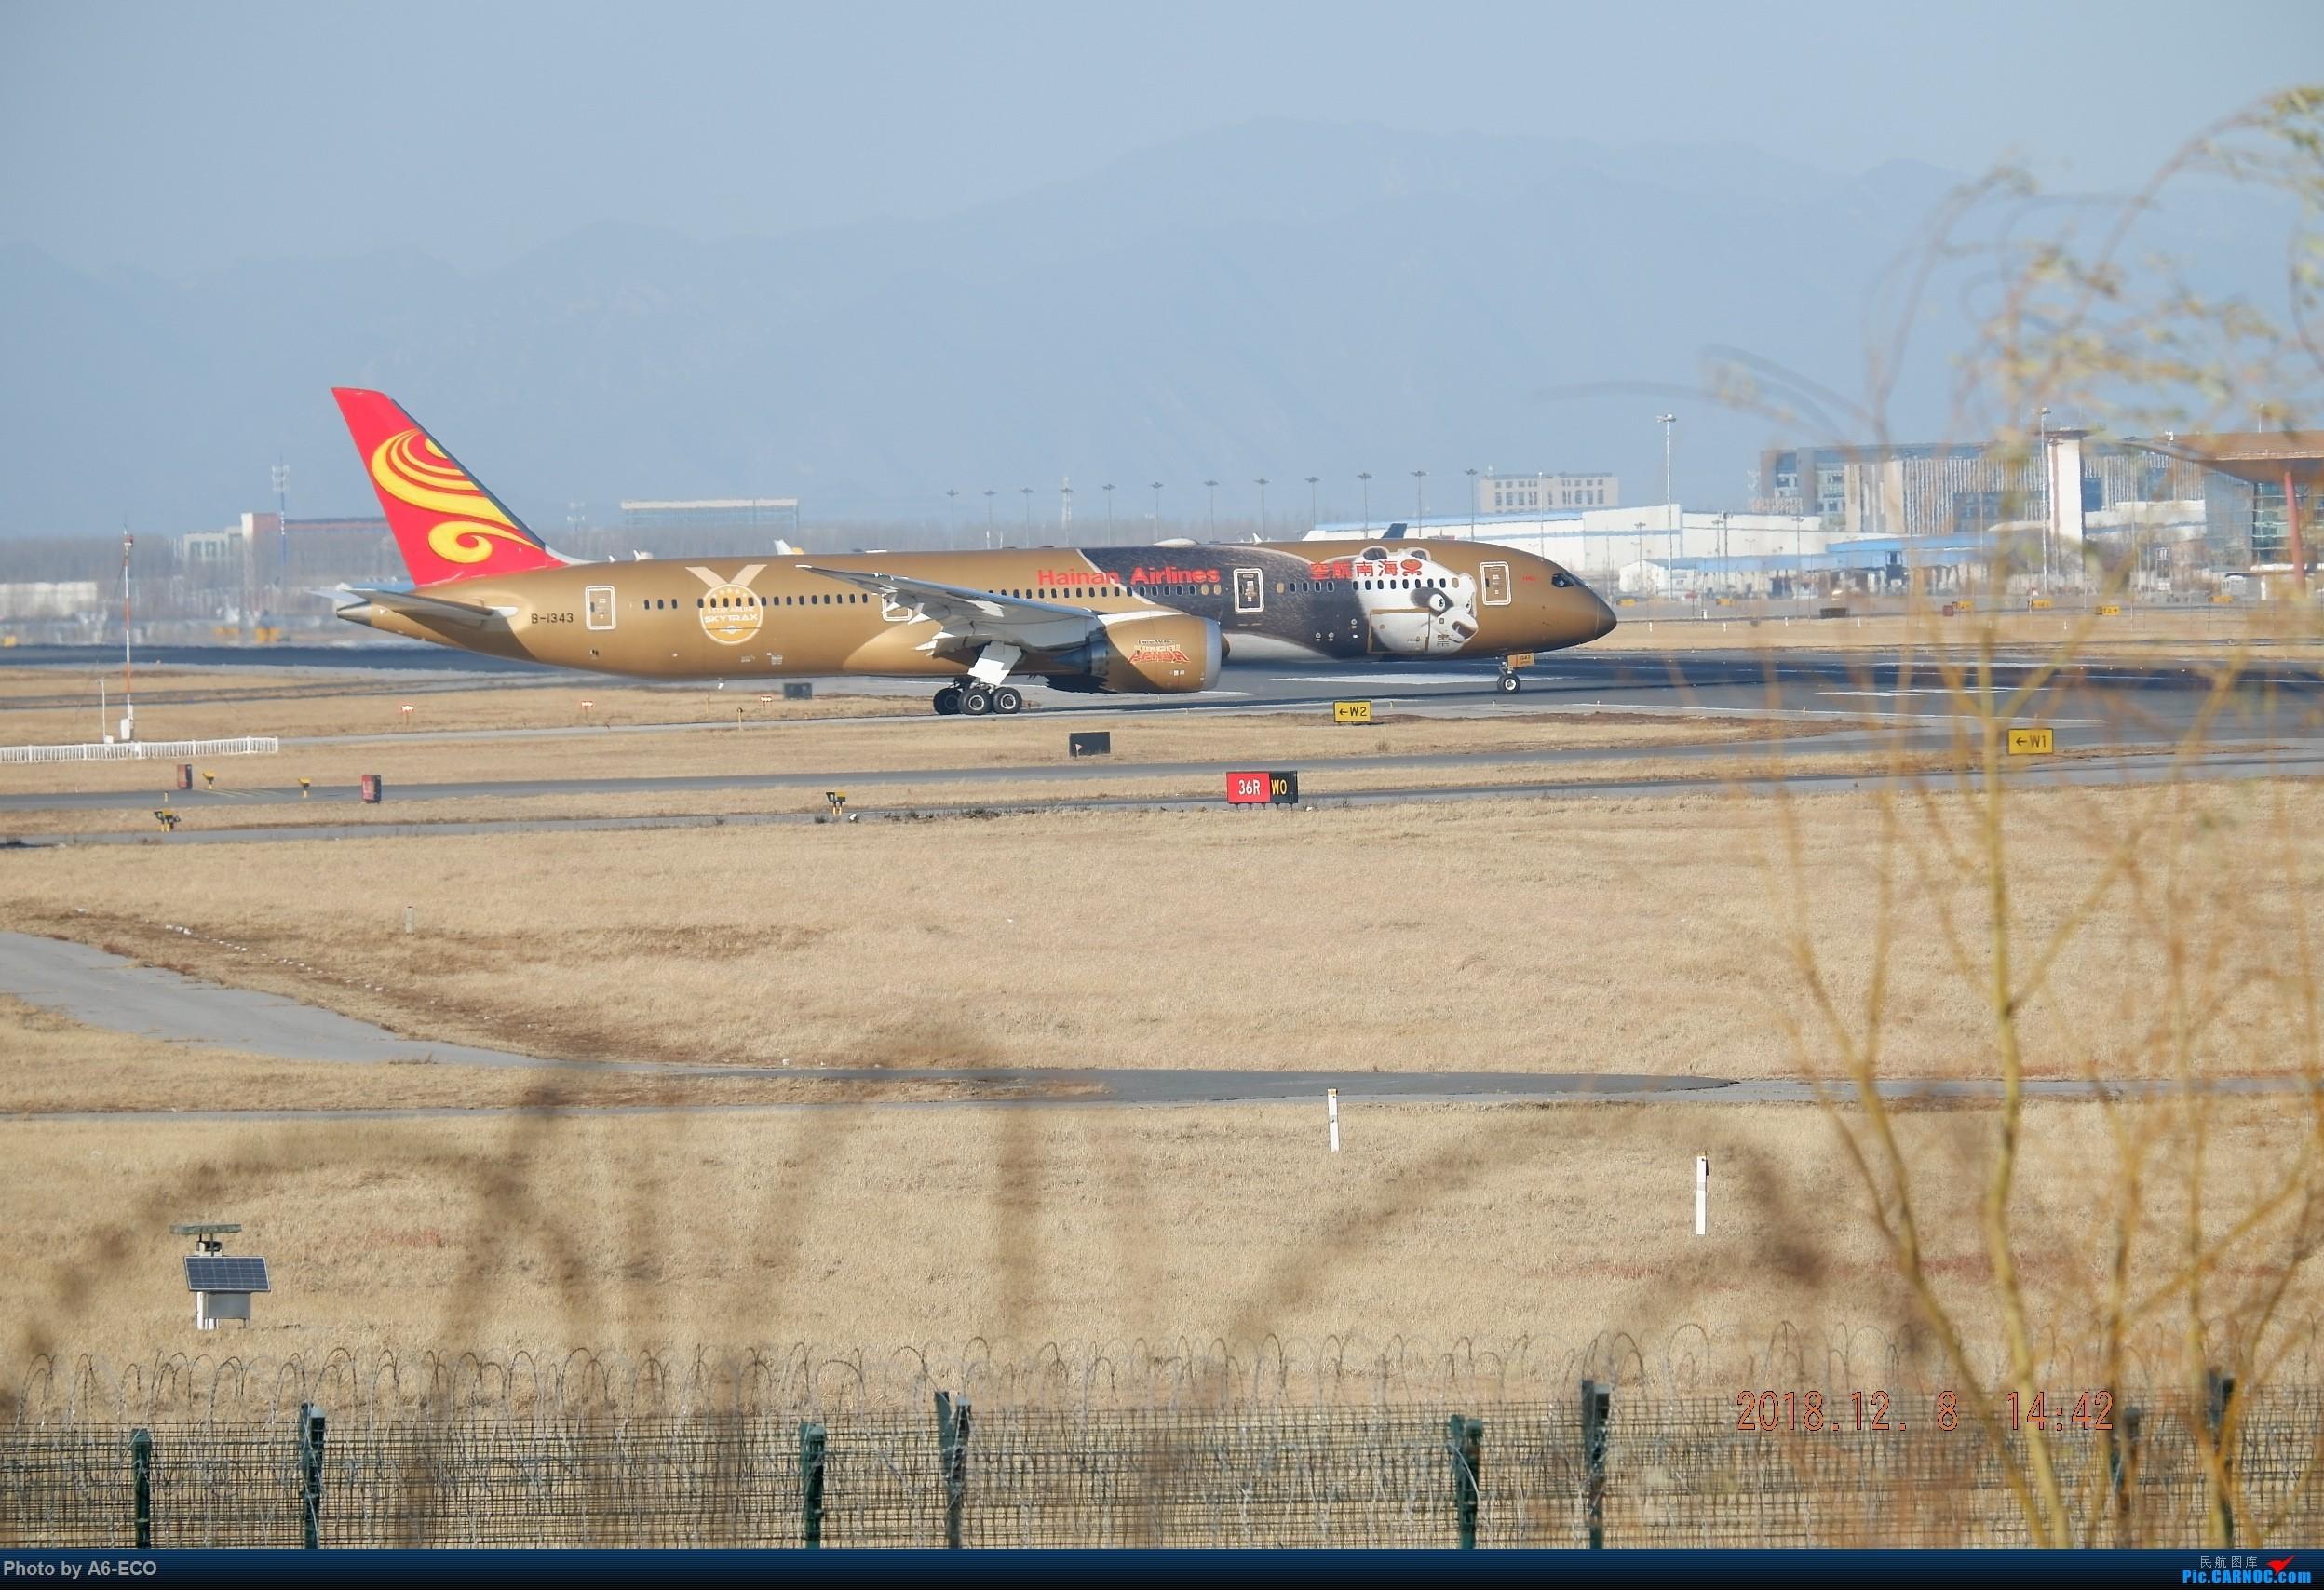 [原创]boeing787's around the world (787九周年纪念) BOEING 787-9 B-1343 中国北京首都国际机场